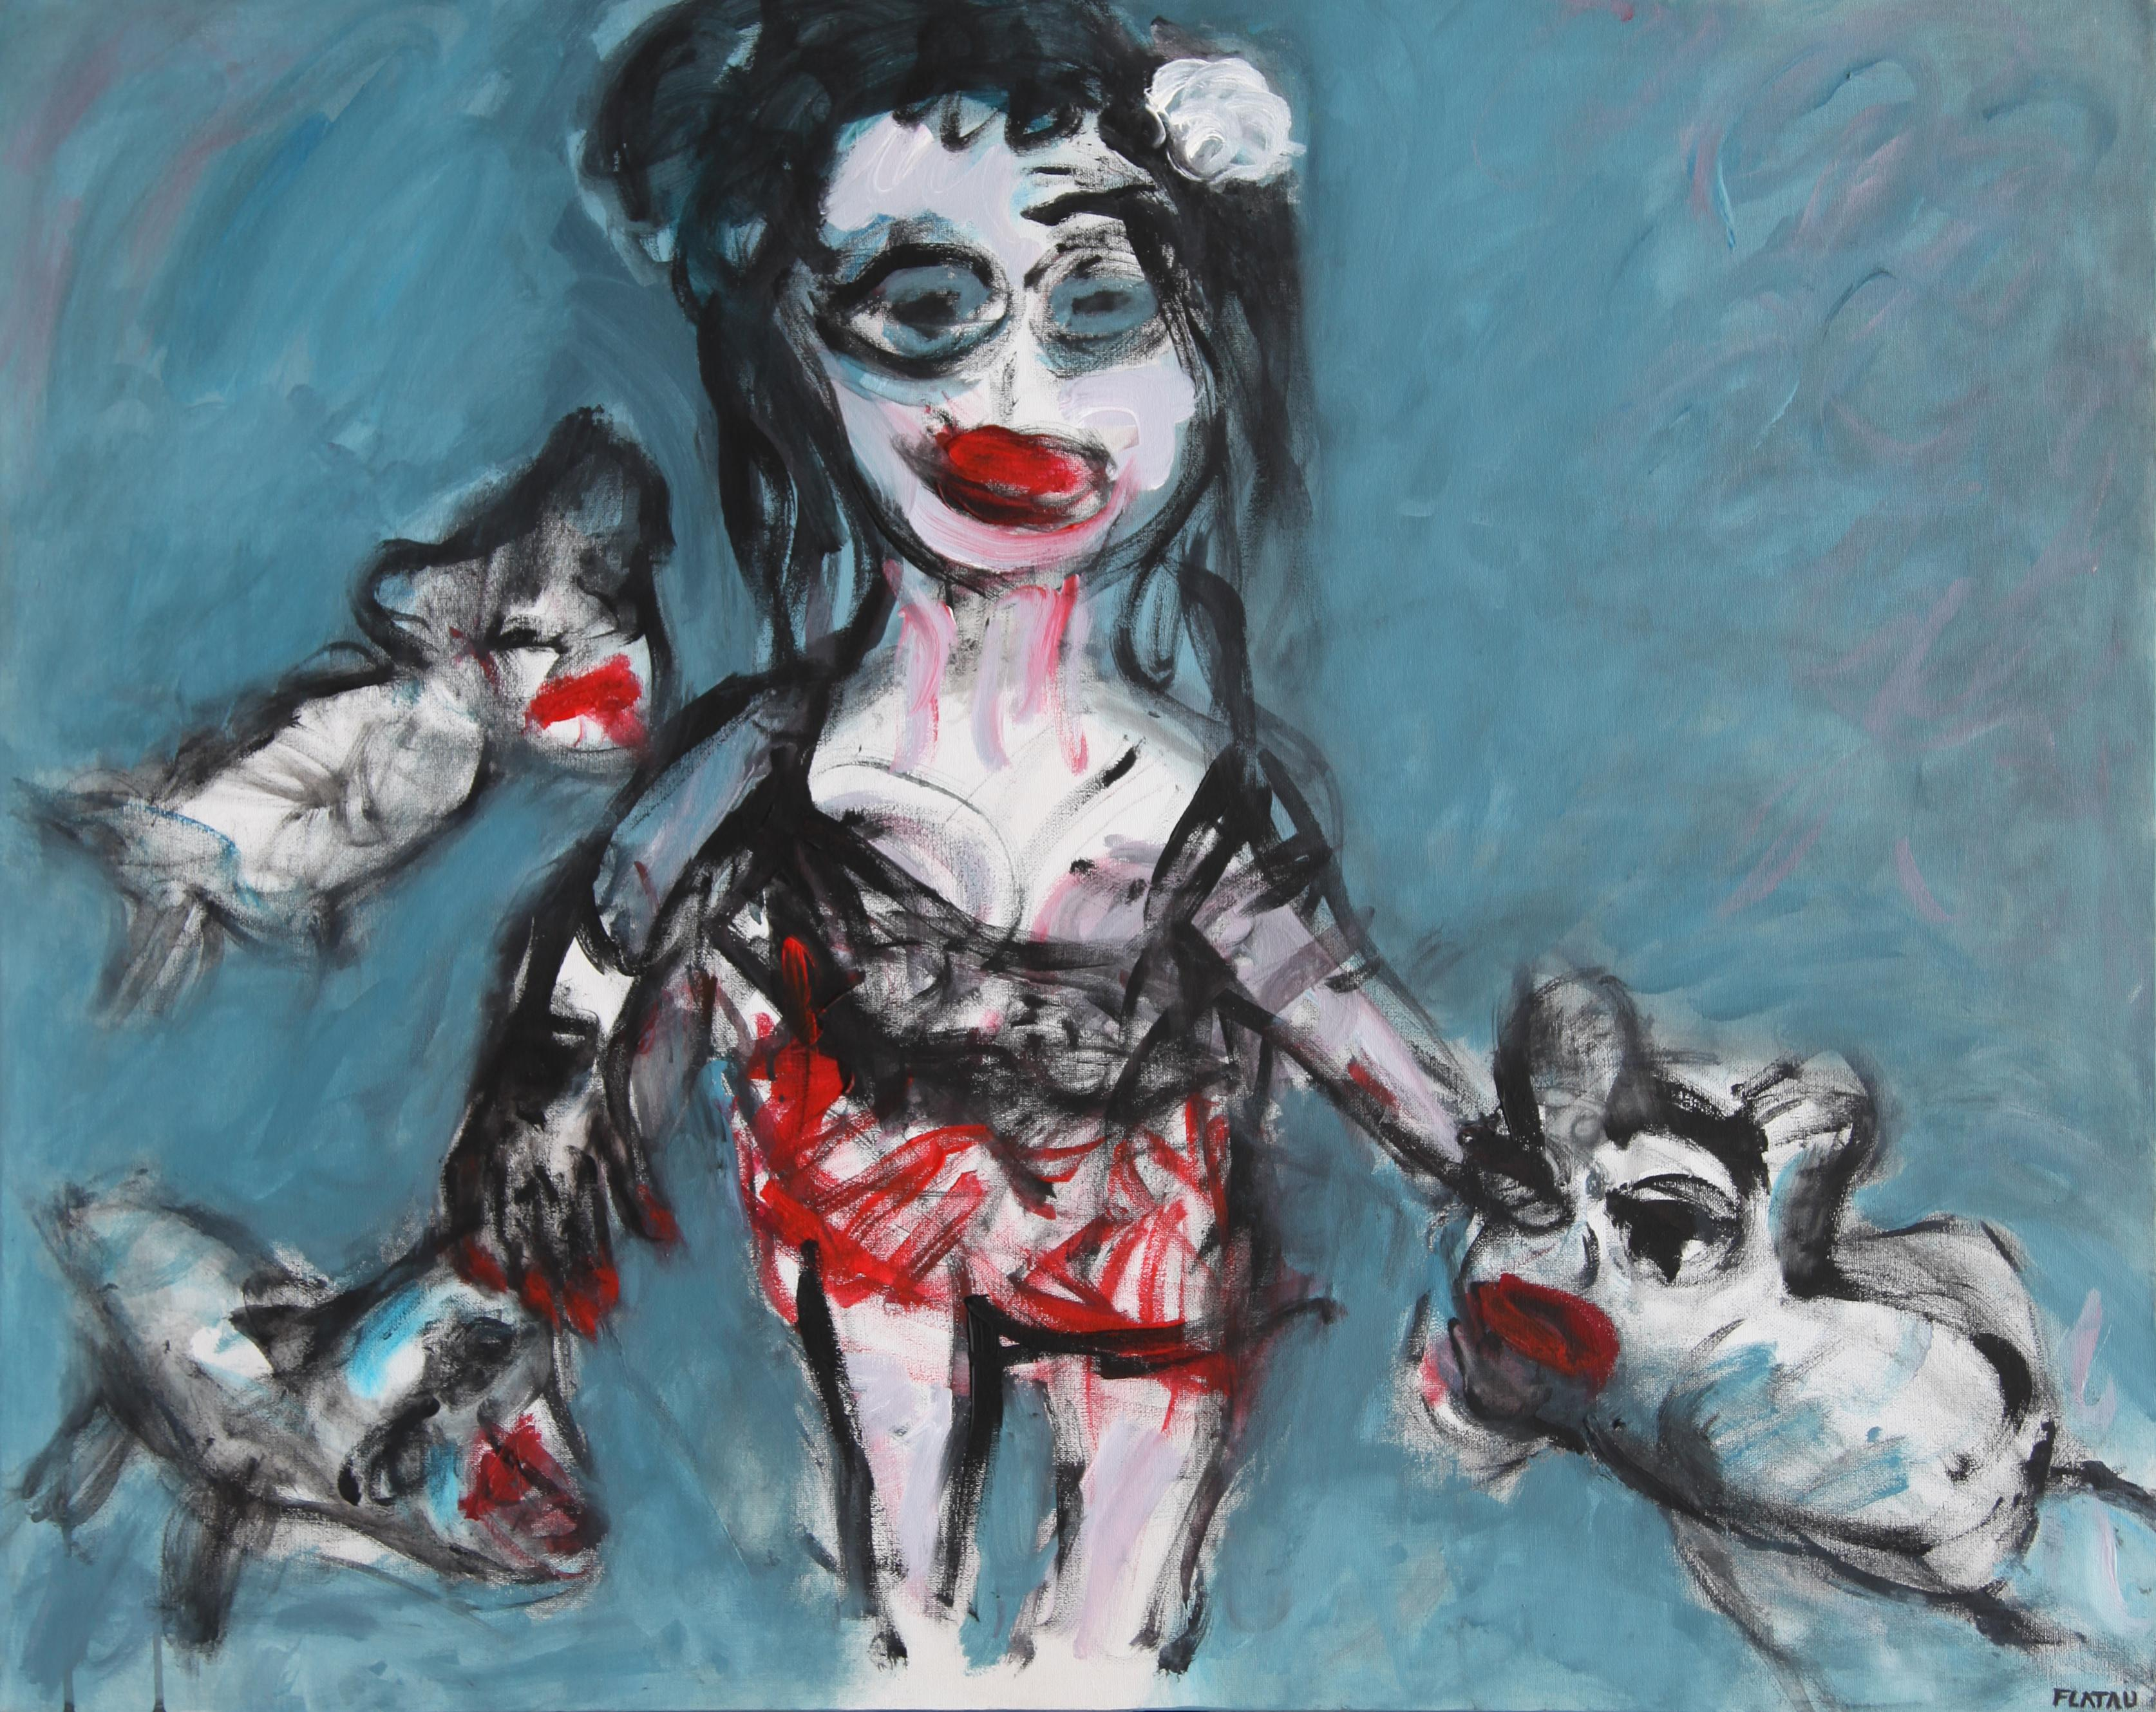 The faithfuls - Joanna Flatau, Contemporary Expressionist painting